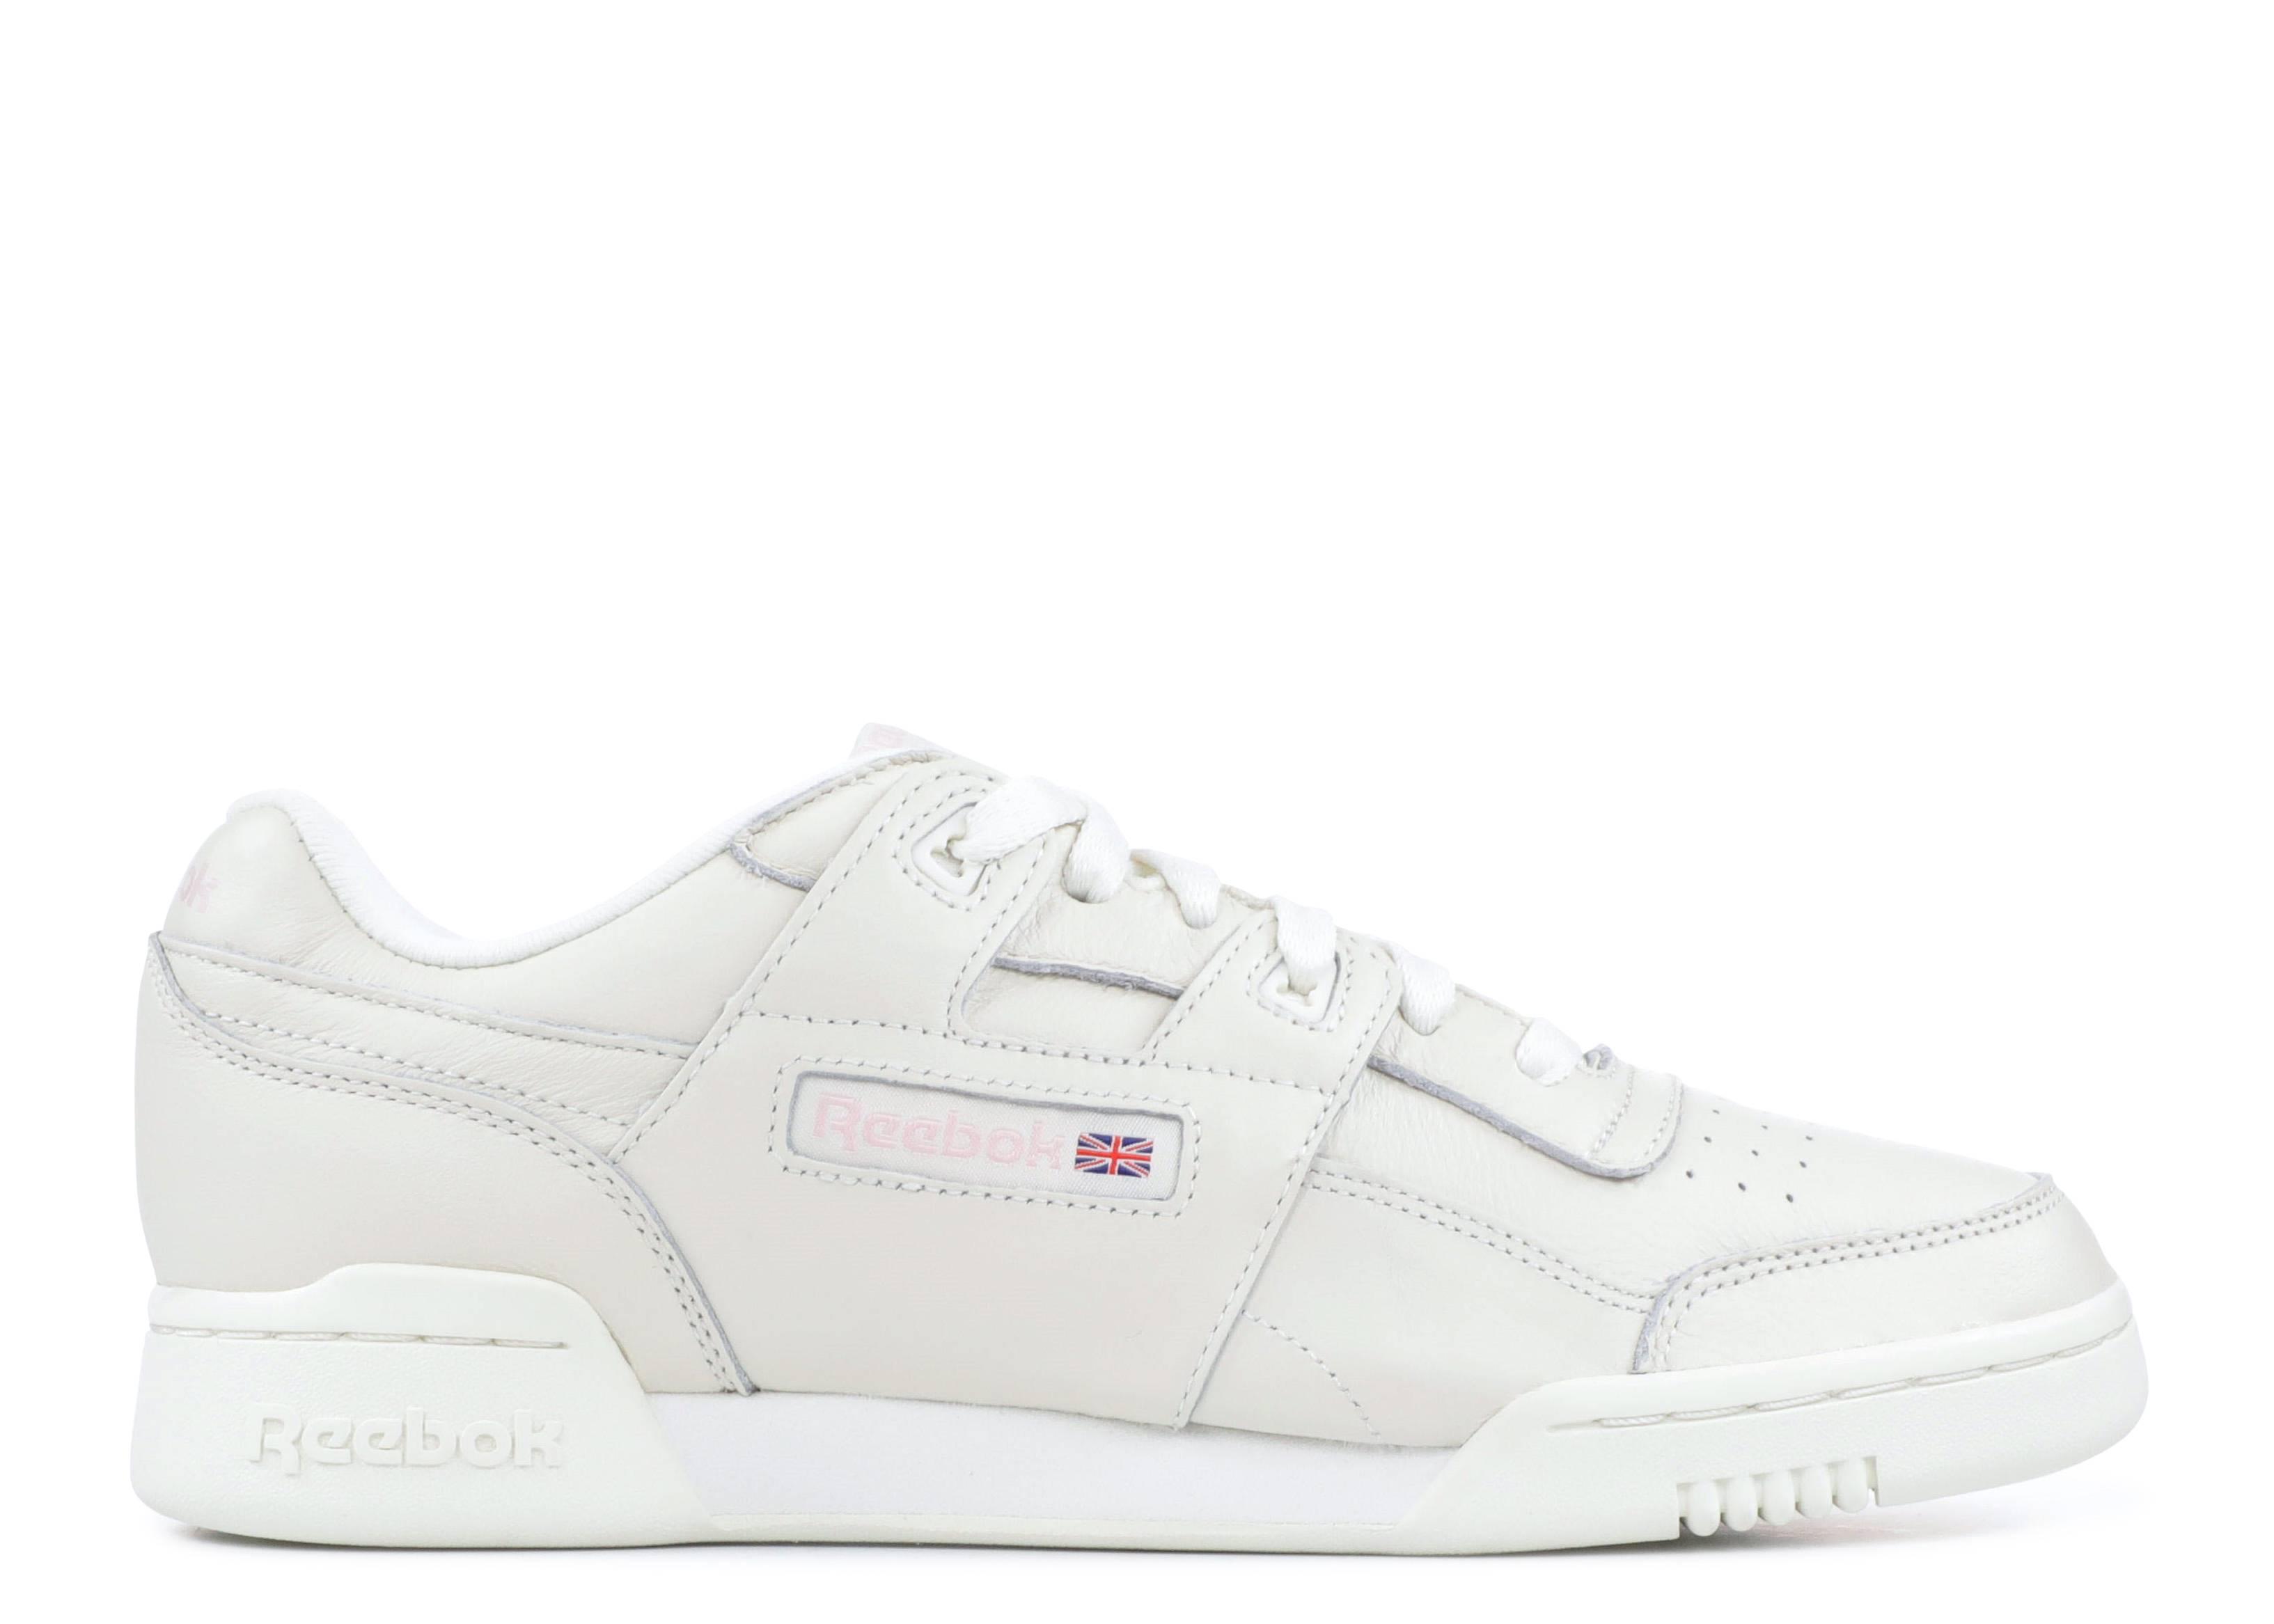 fc912b6c26f W workout lo plus reebok vintage white practical pink jpg 1600x1140  Sneakers reebok vintage pink